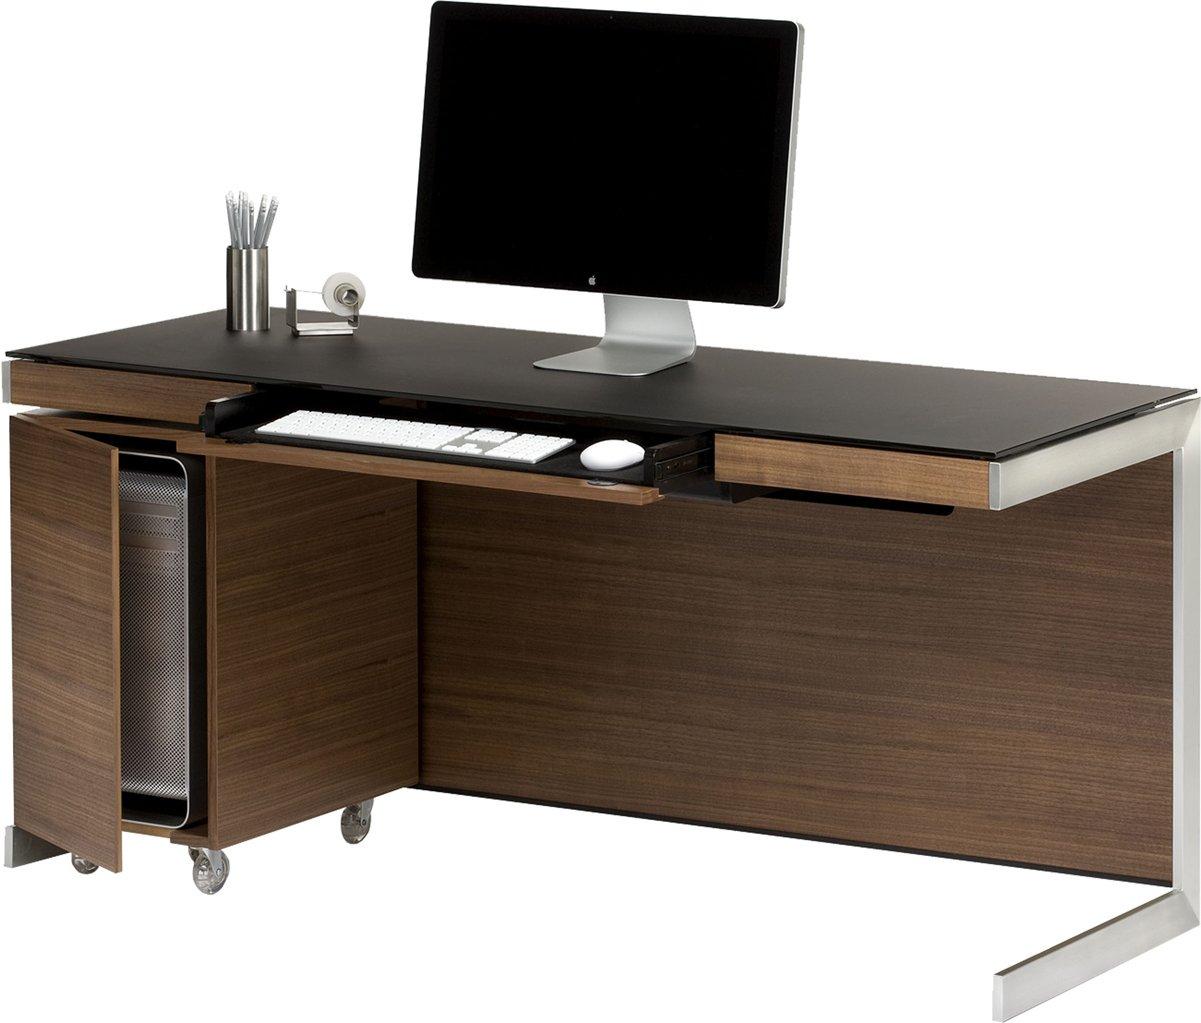 Bdi Sequel 6001 Walnut Computer Desk